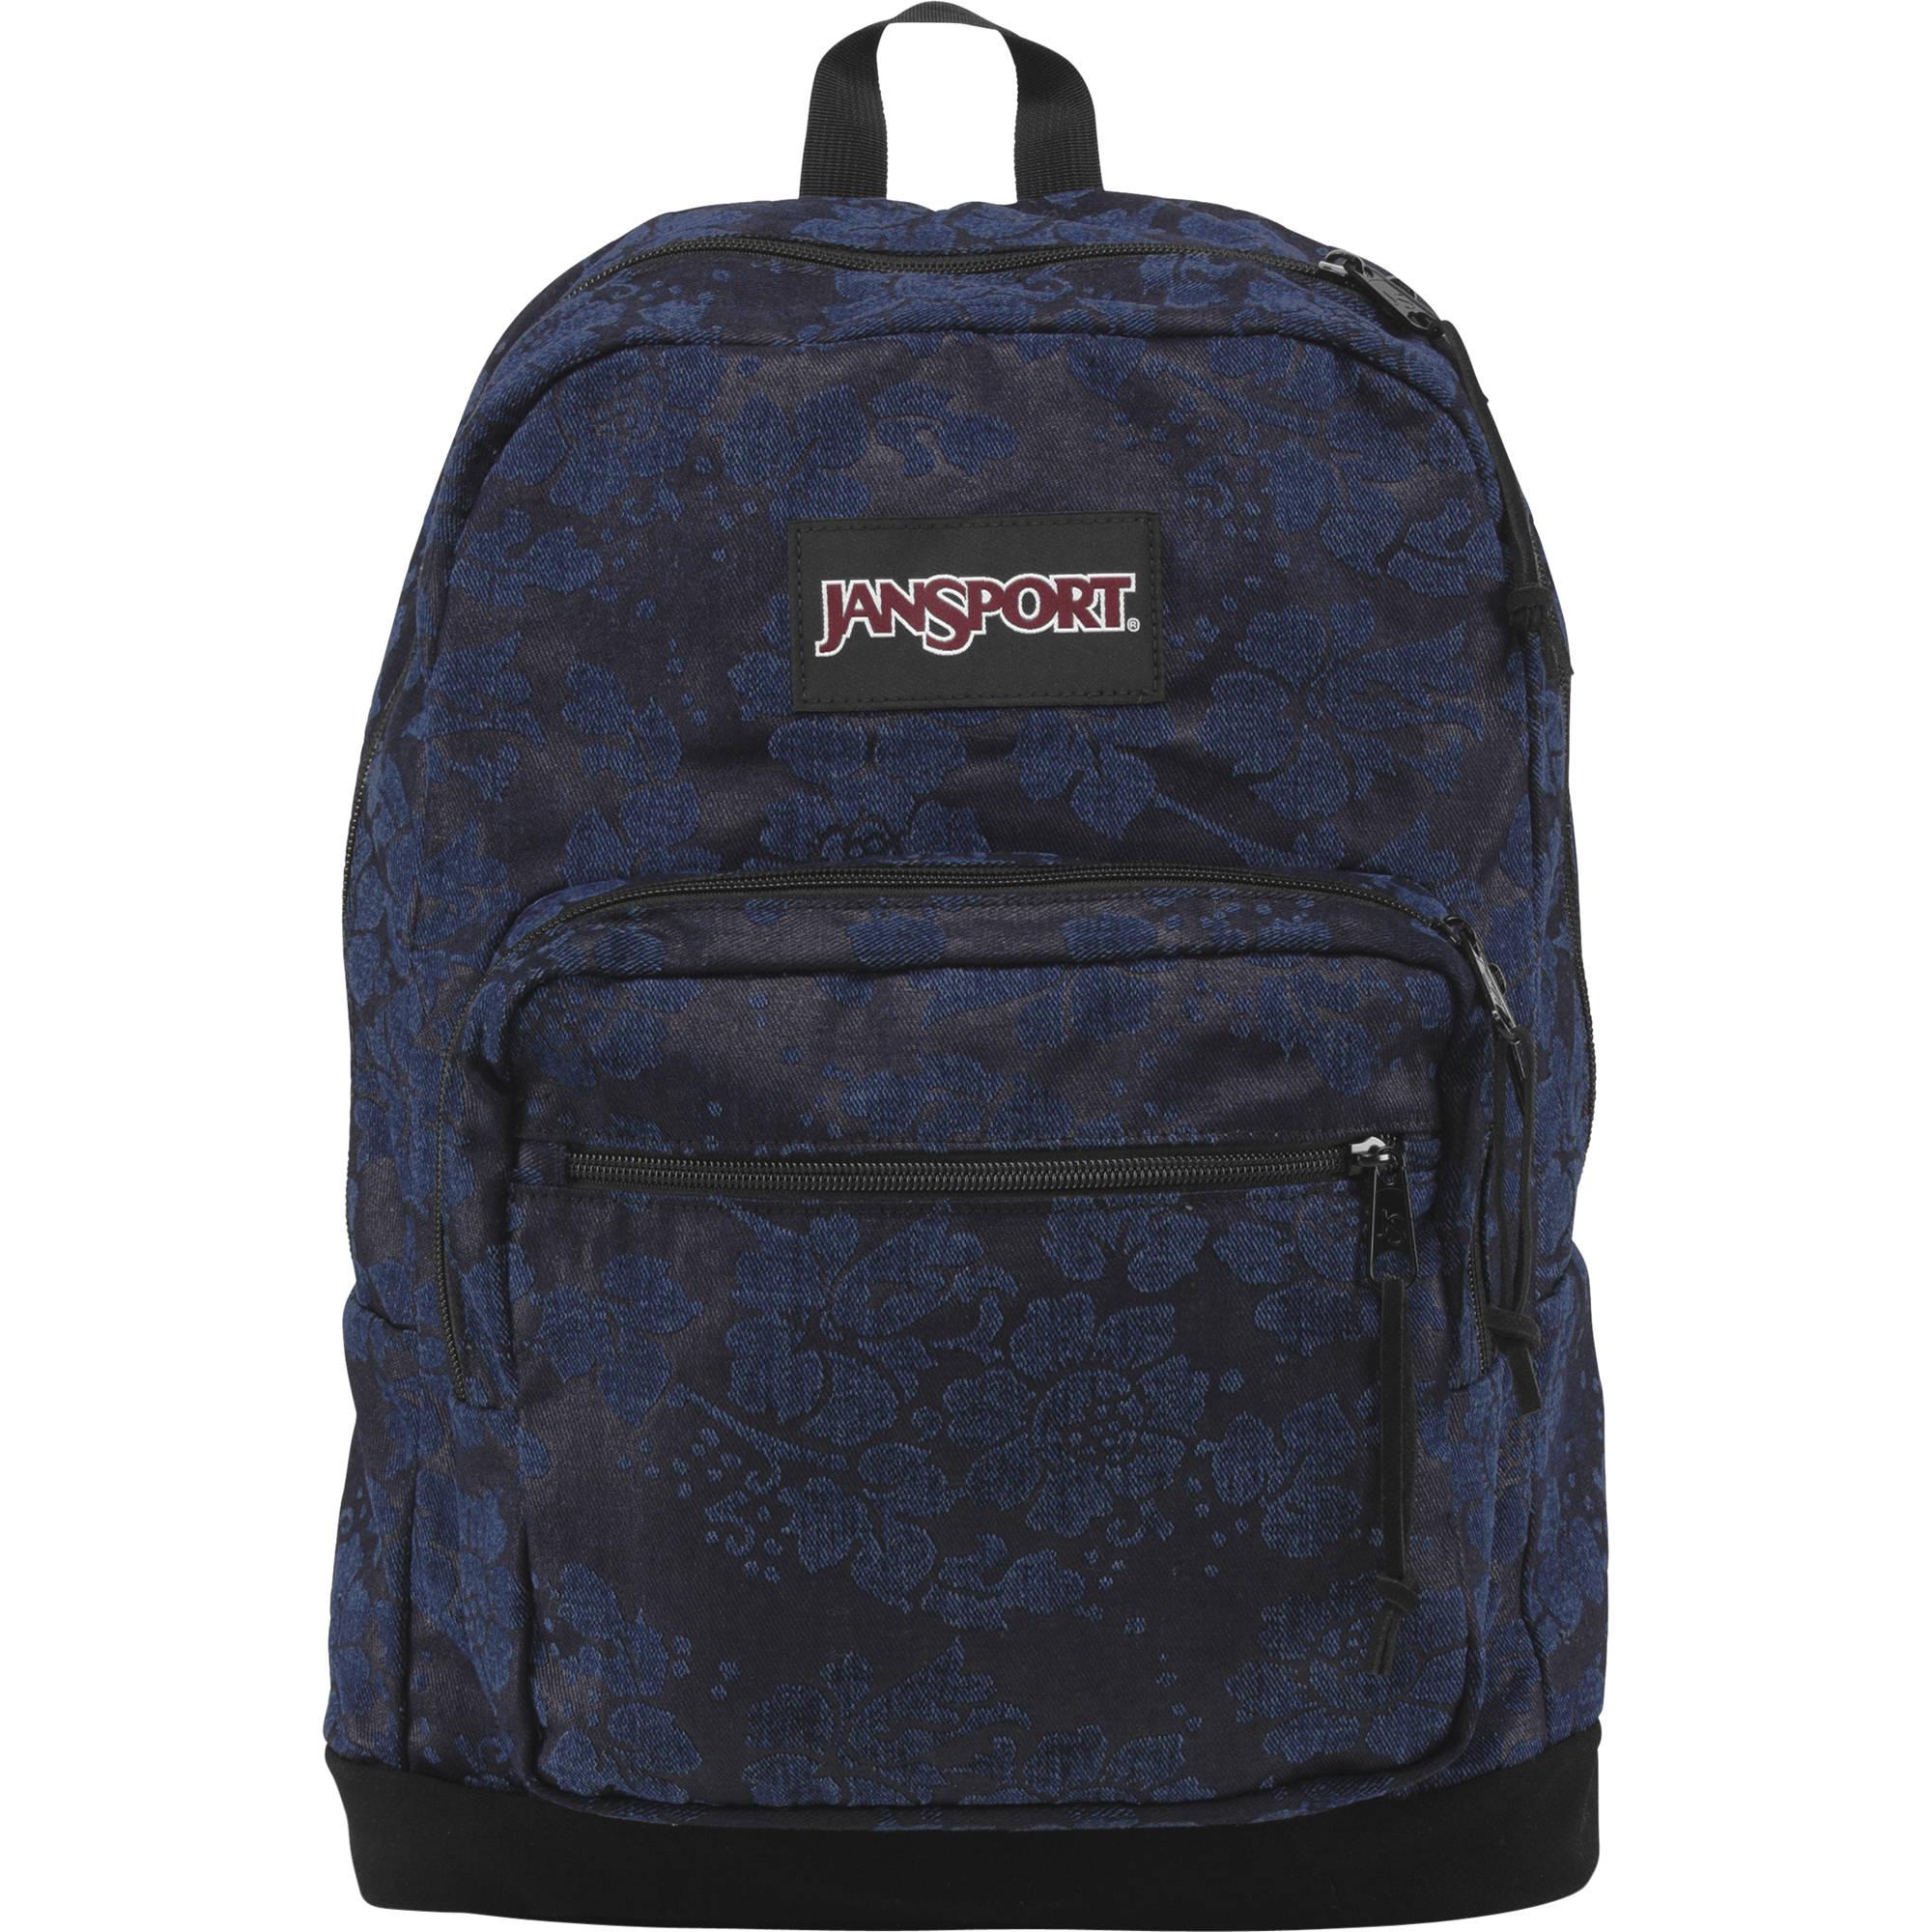 JanSport Right Pack Digital Edition 31L Backpack T58TZM0 B&H